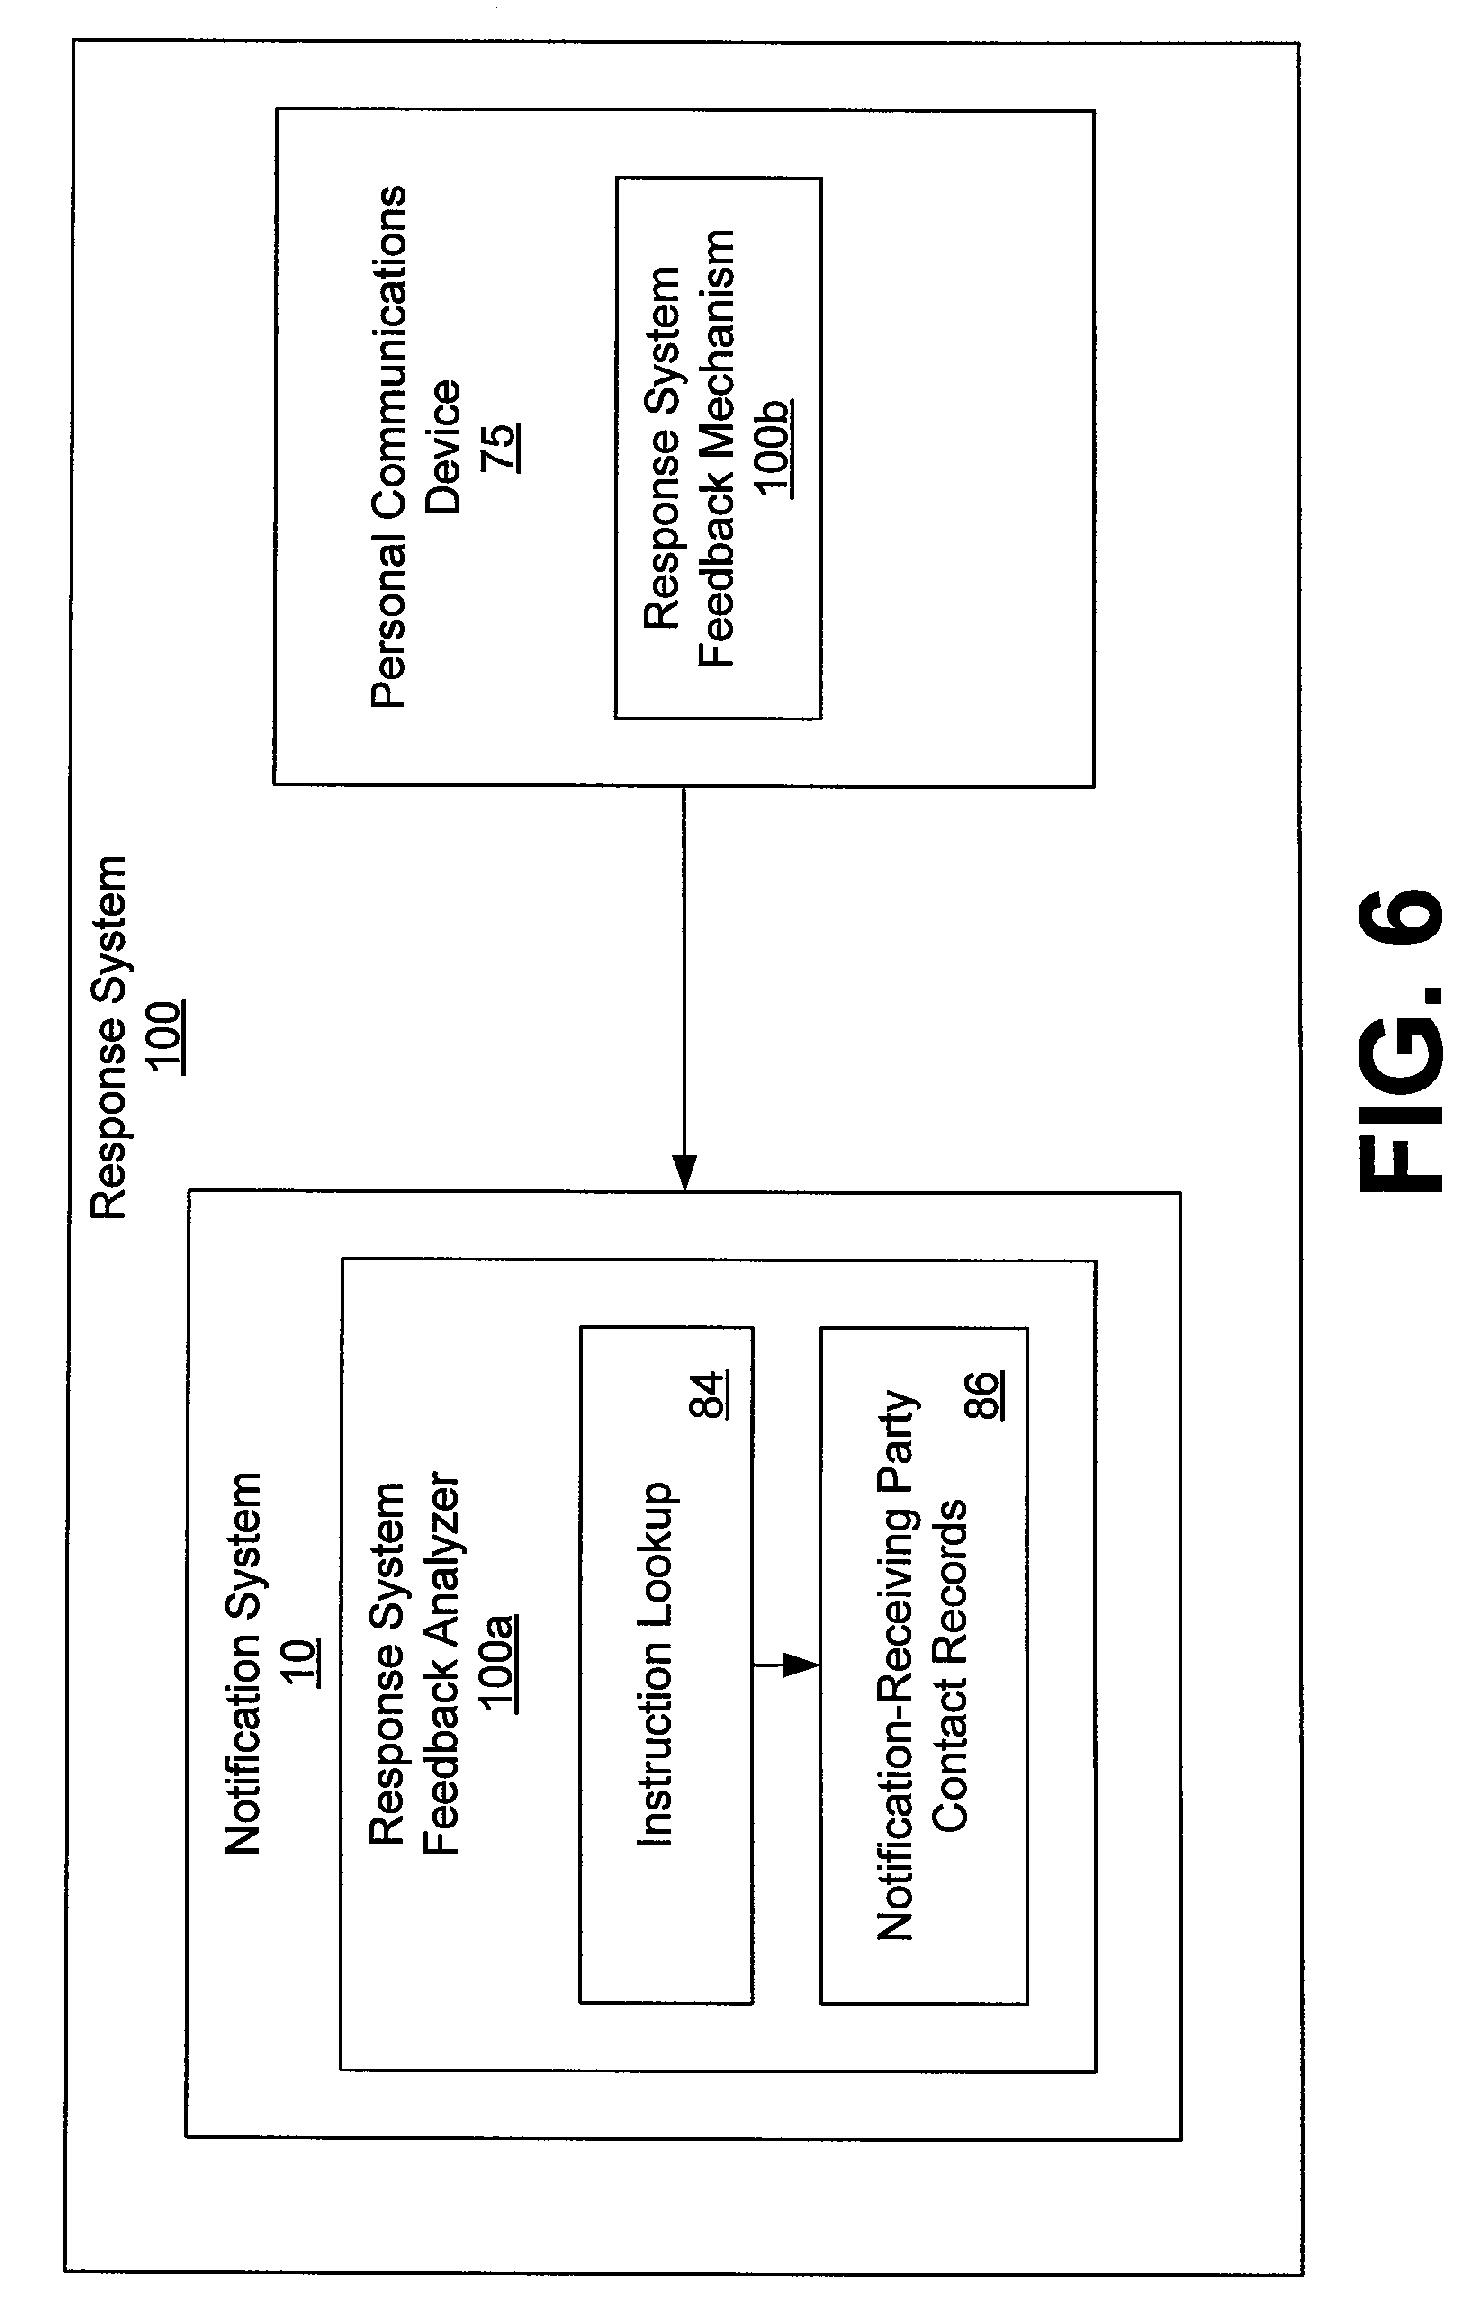 Patent US 7,504,966 B2